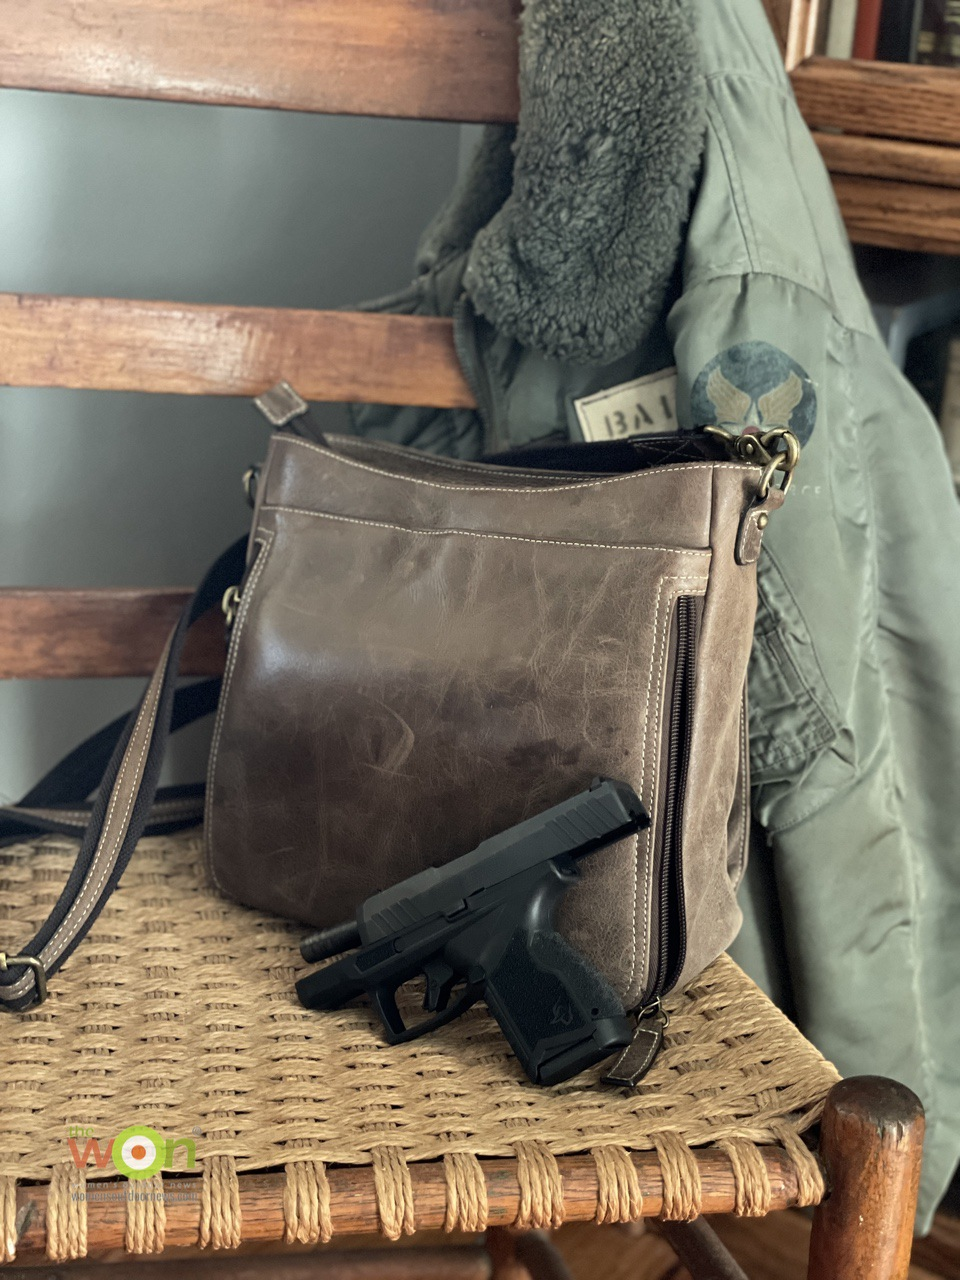 Taurus GX4 and GTM distressed leather slim X-body purse